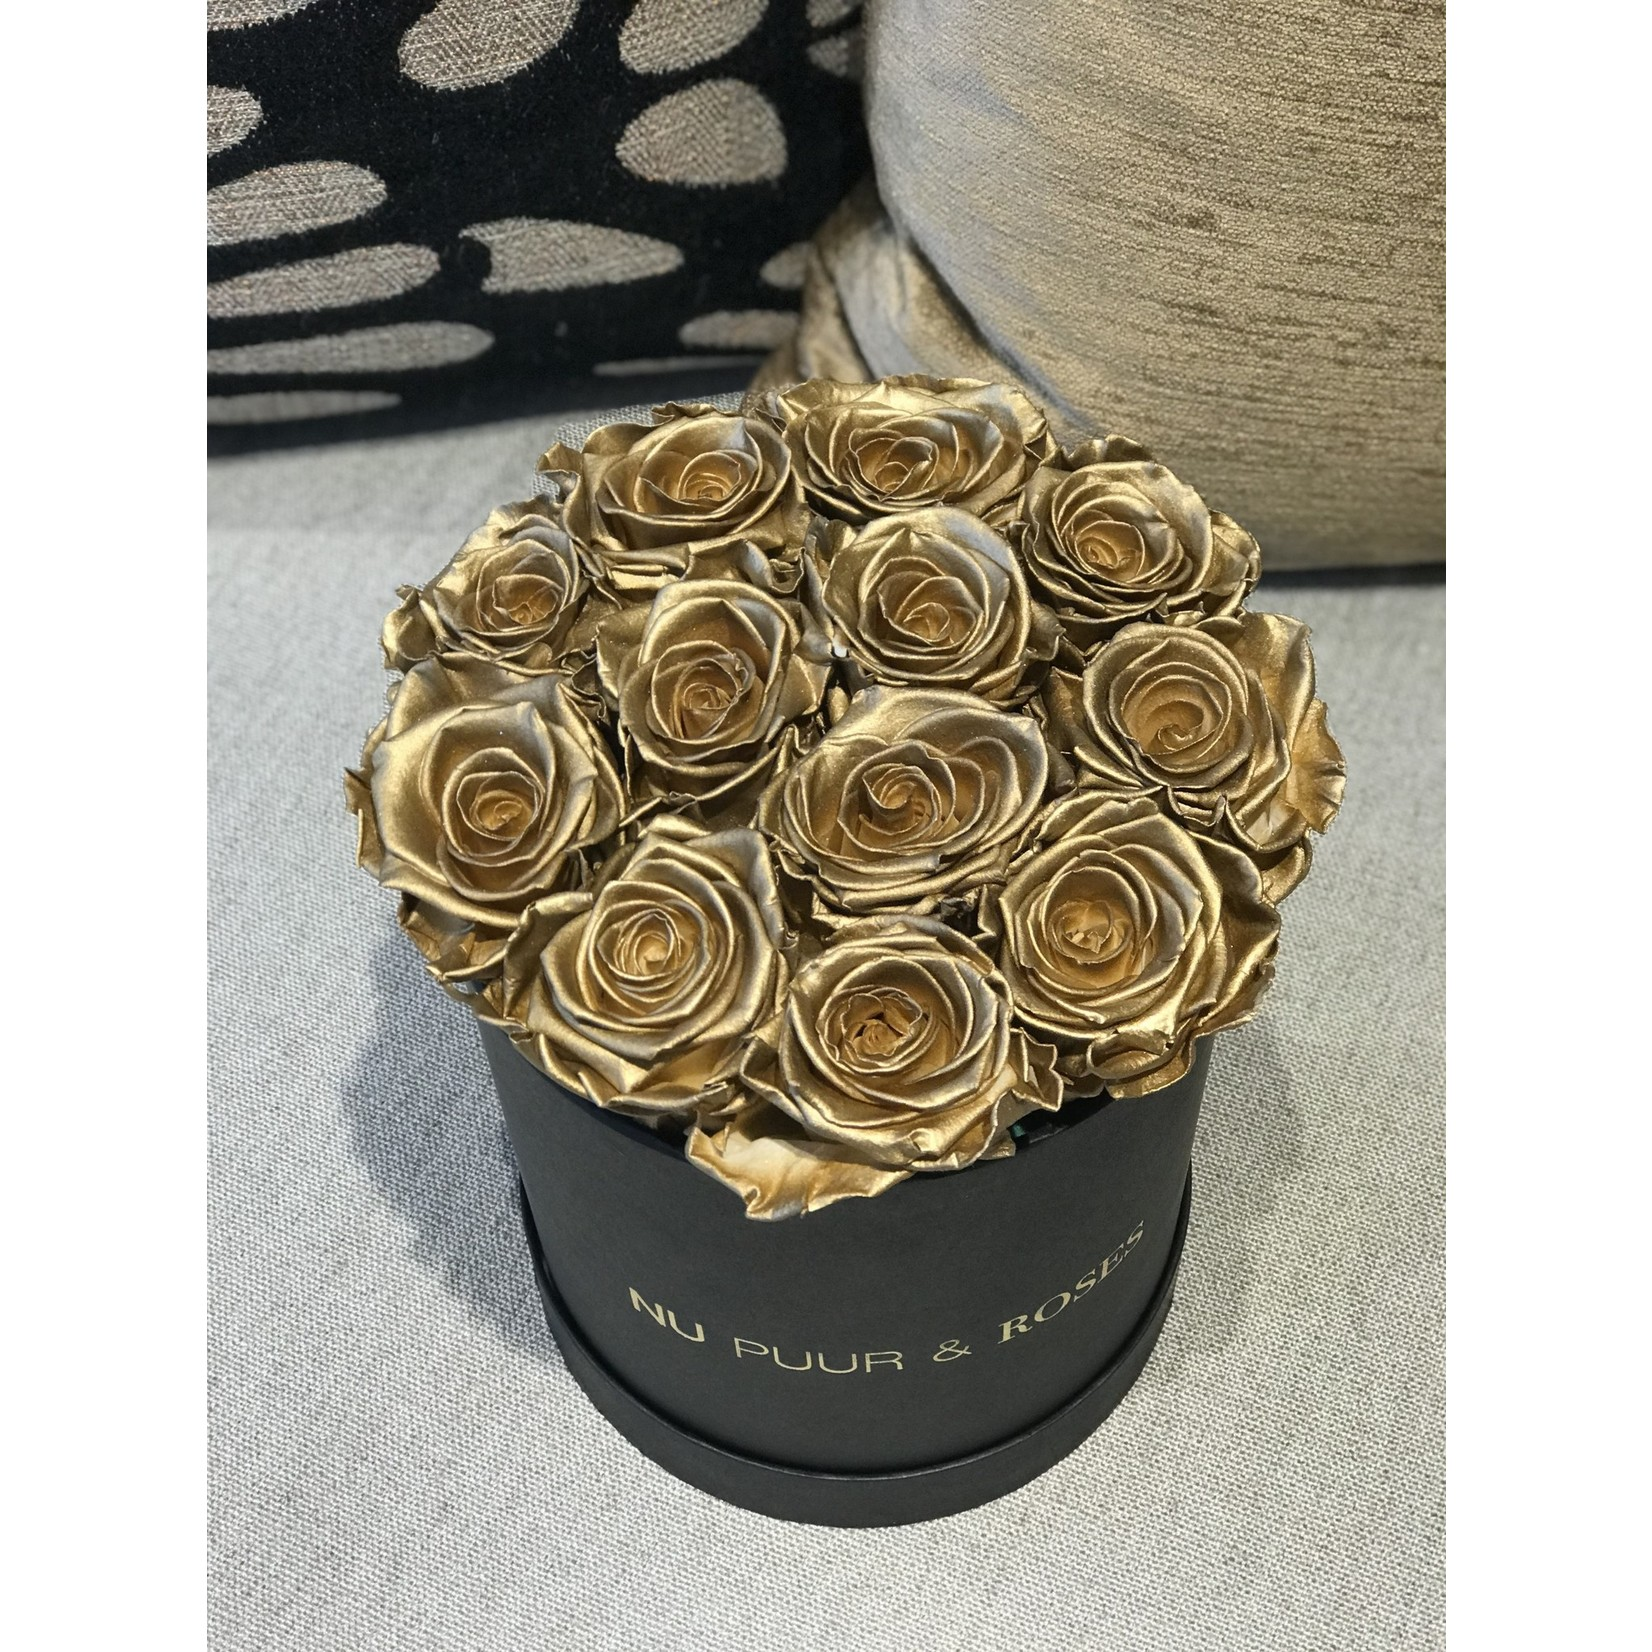 Small - Gold Endless Roses - Black Box